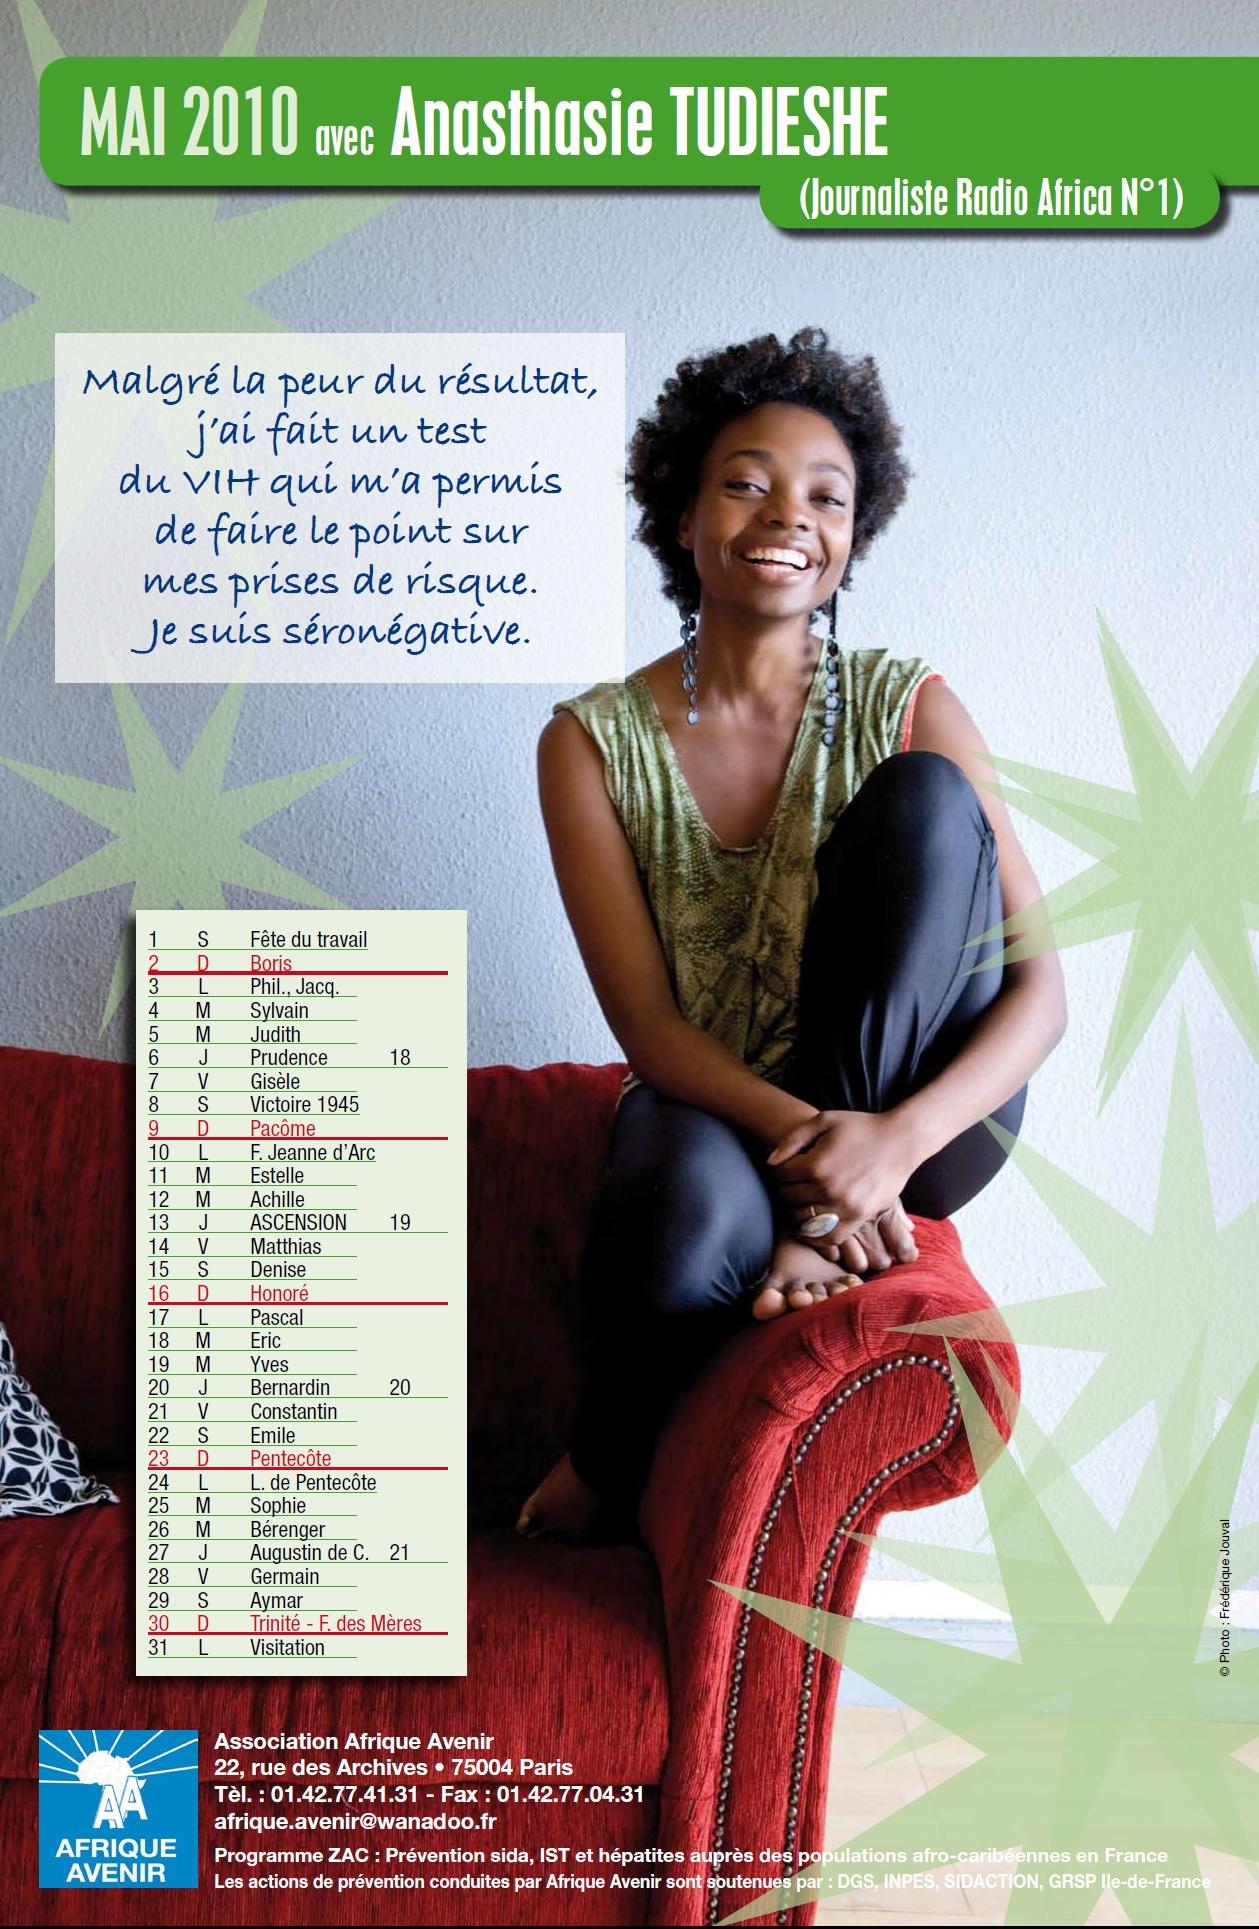 Contre le VIH/Sida avec Anasthasie TUDIESHE